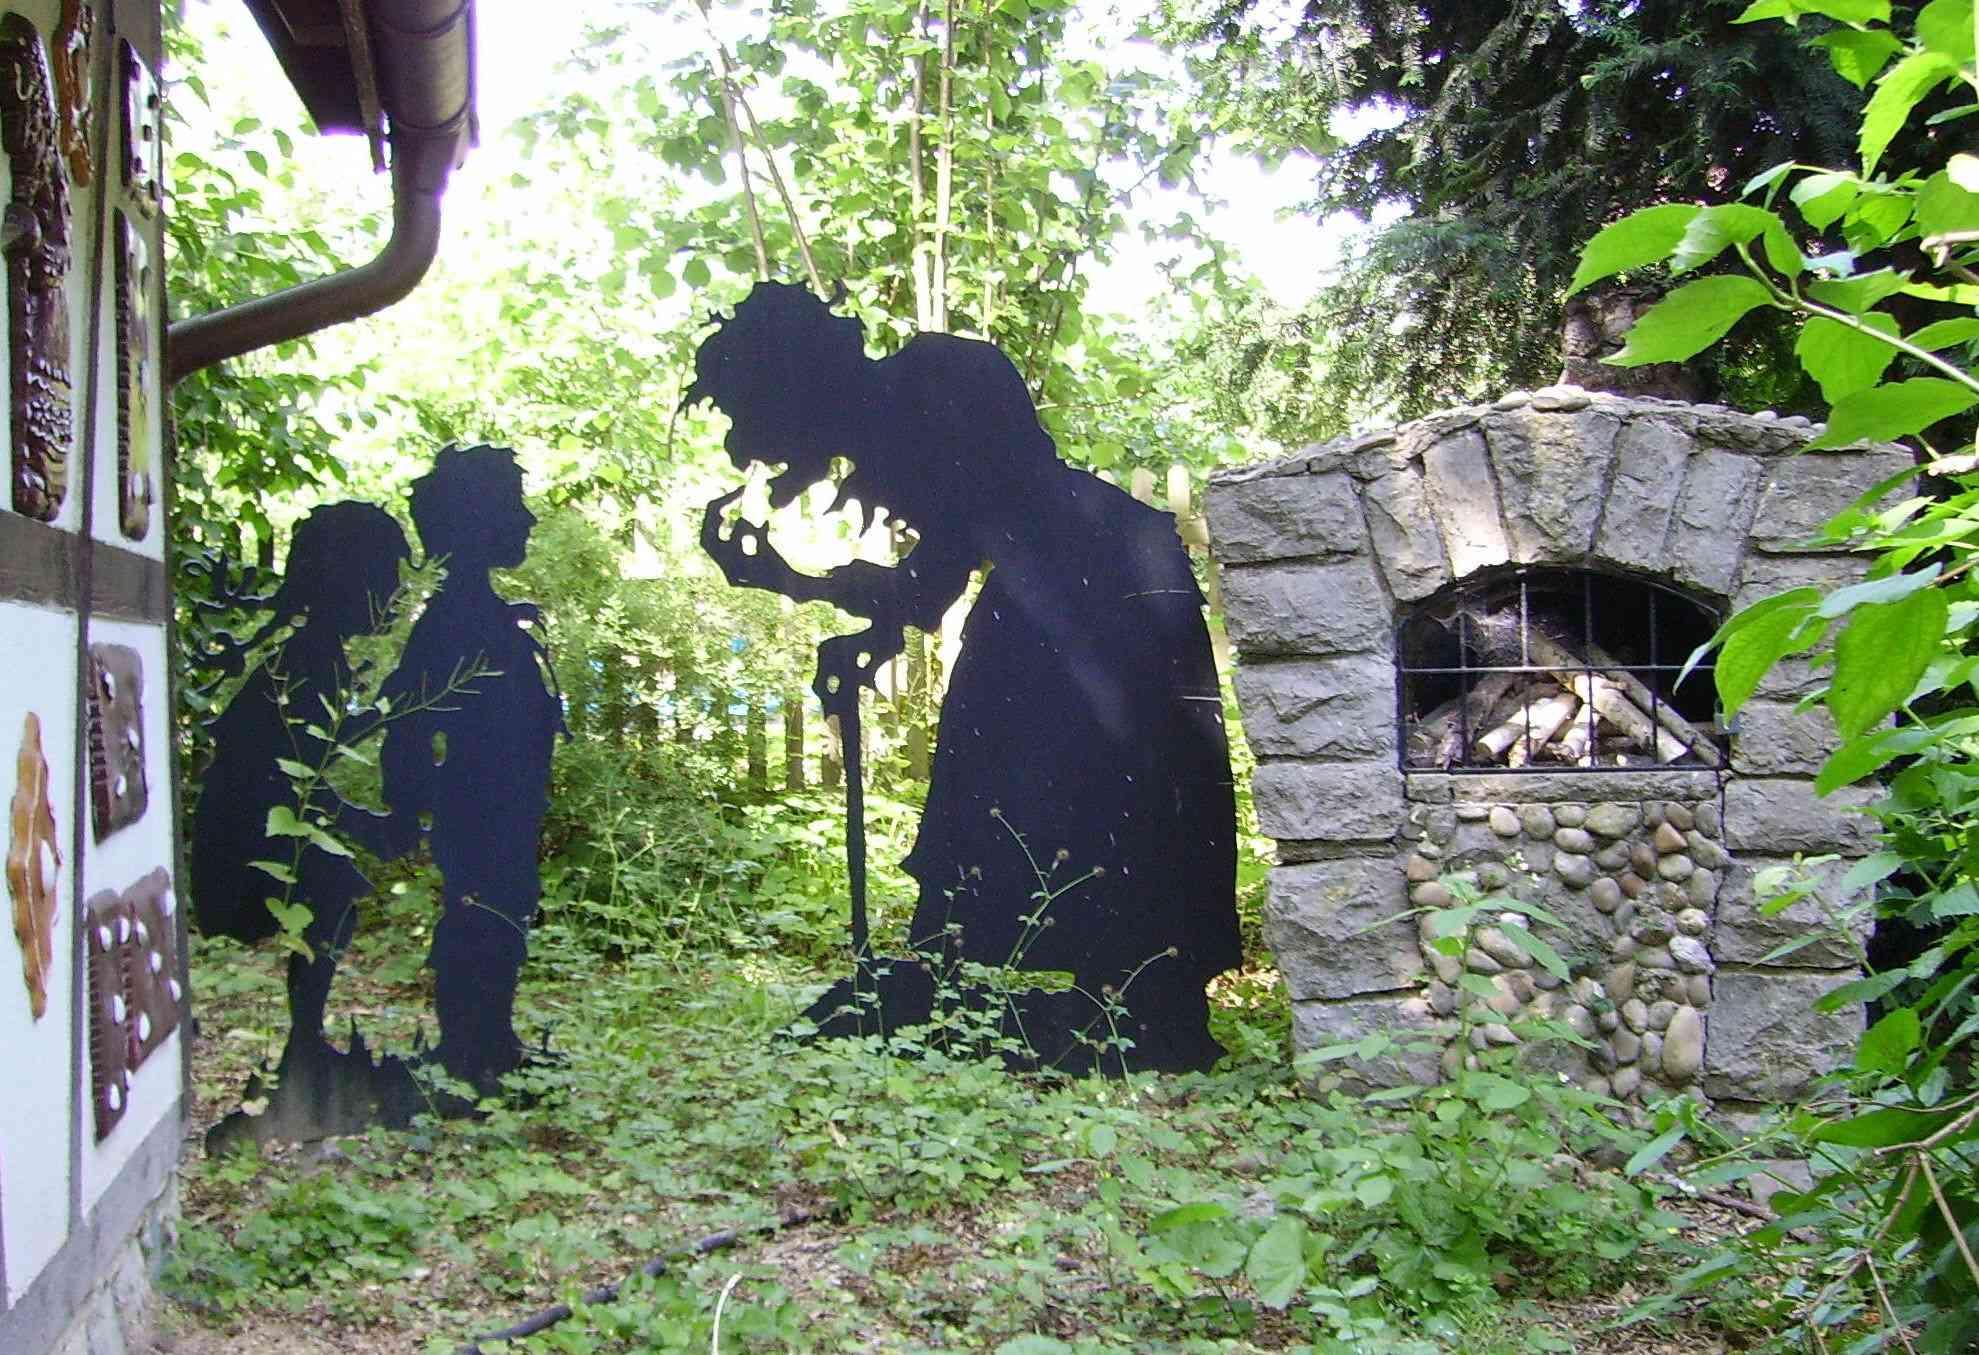 Metal statues of Hansel and Gretel at Märchengarten